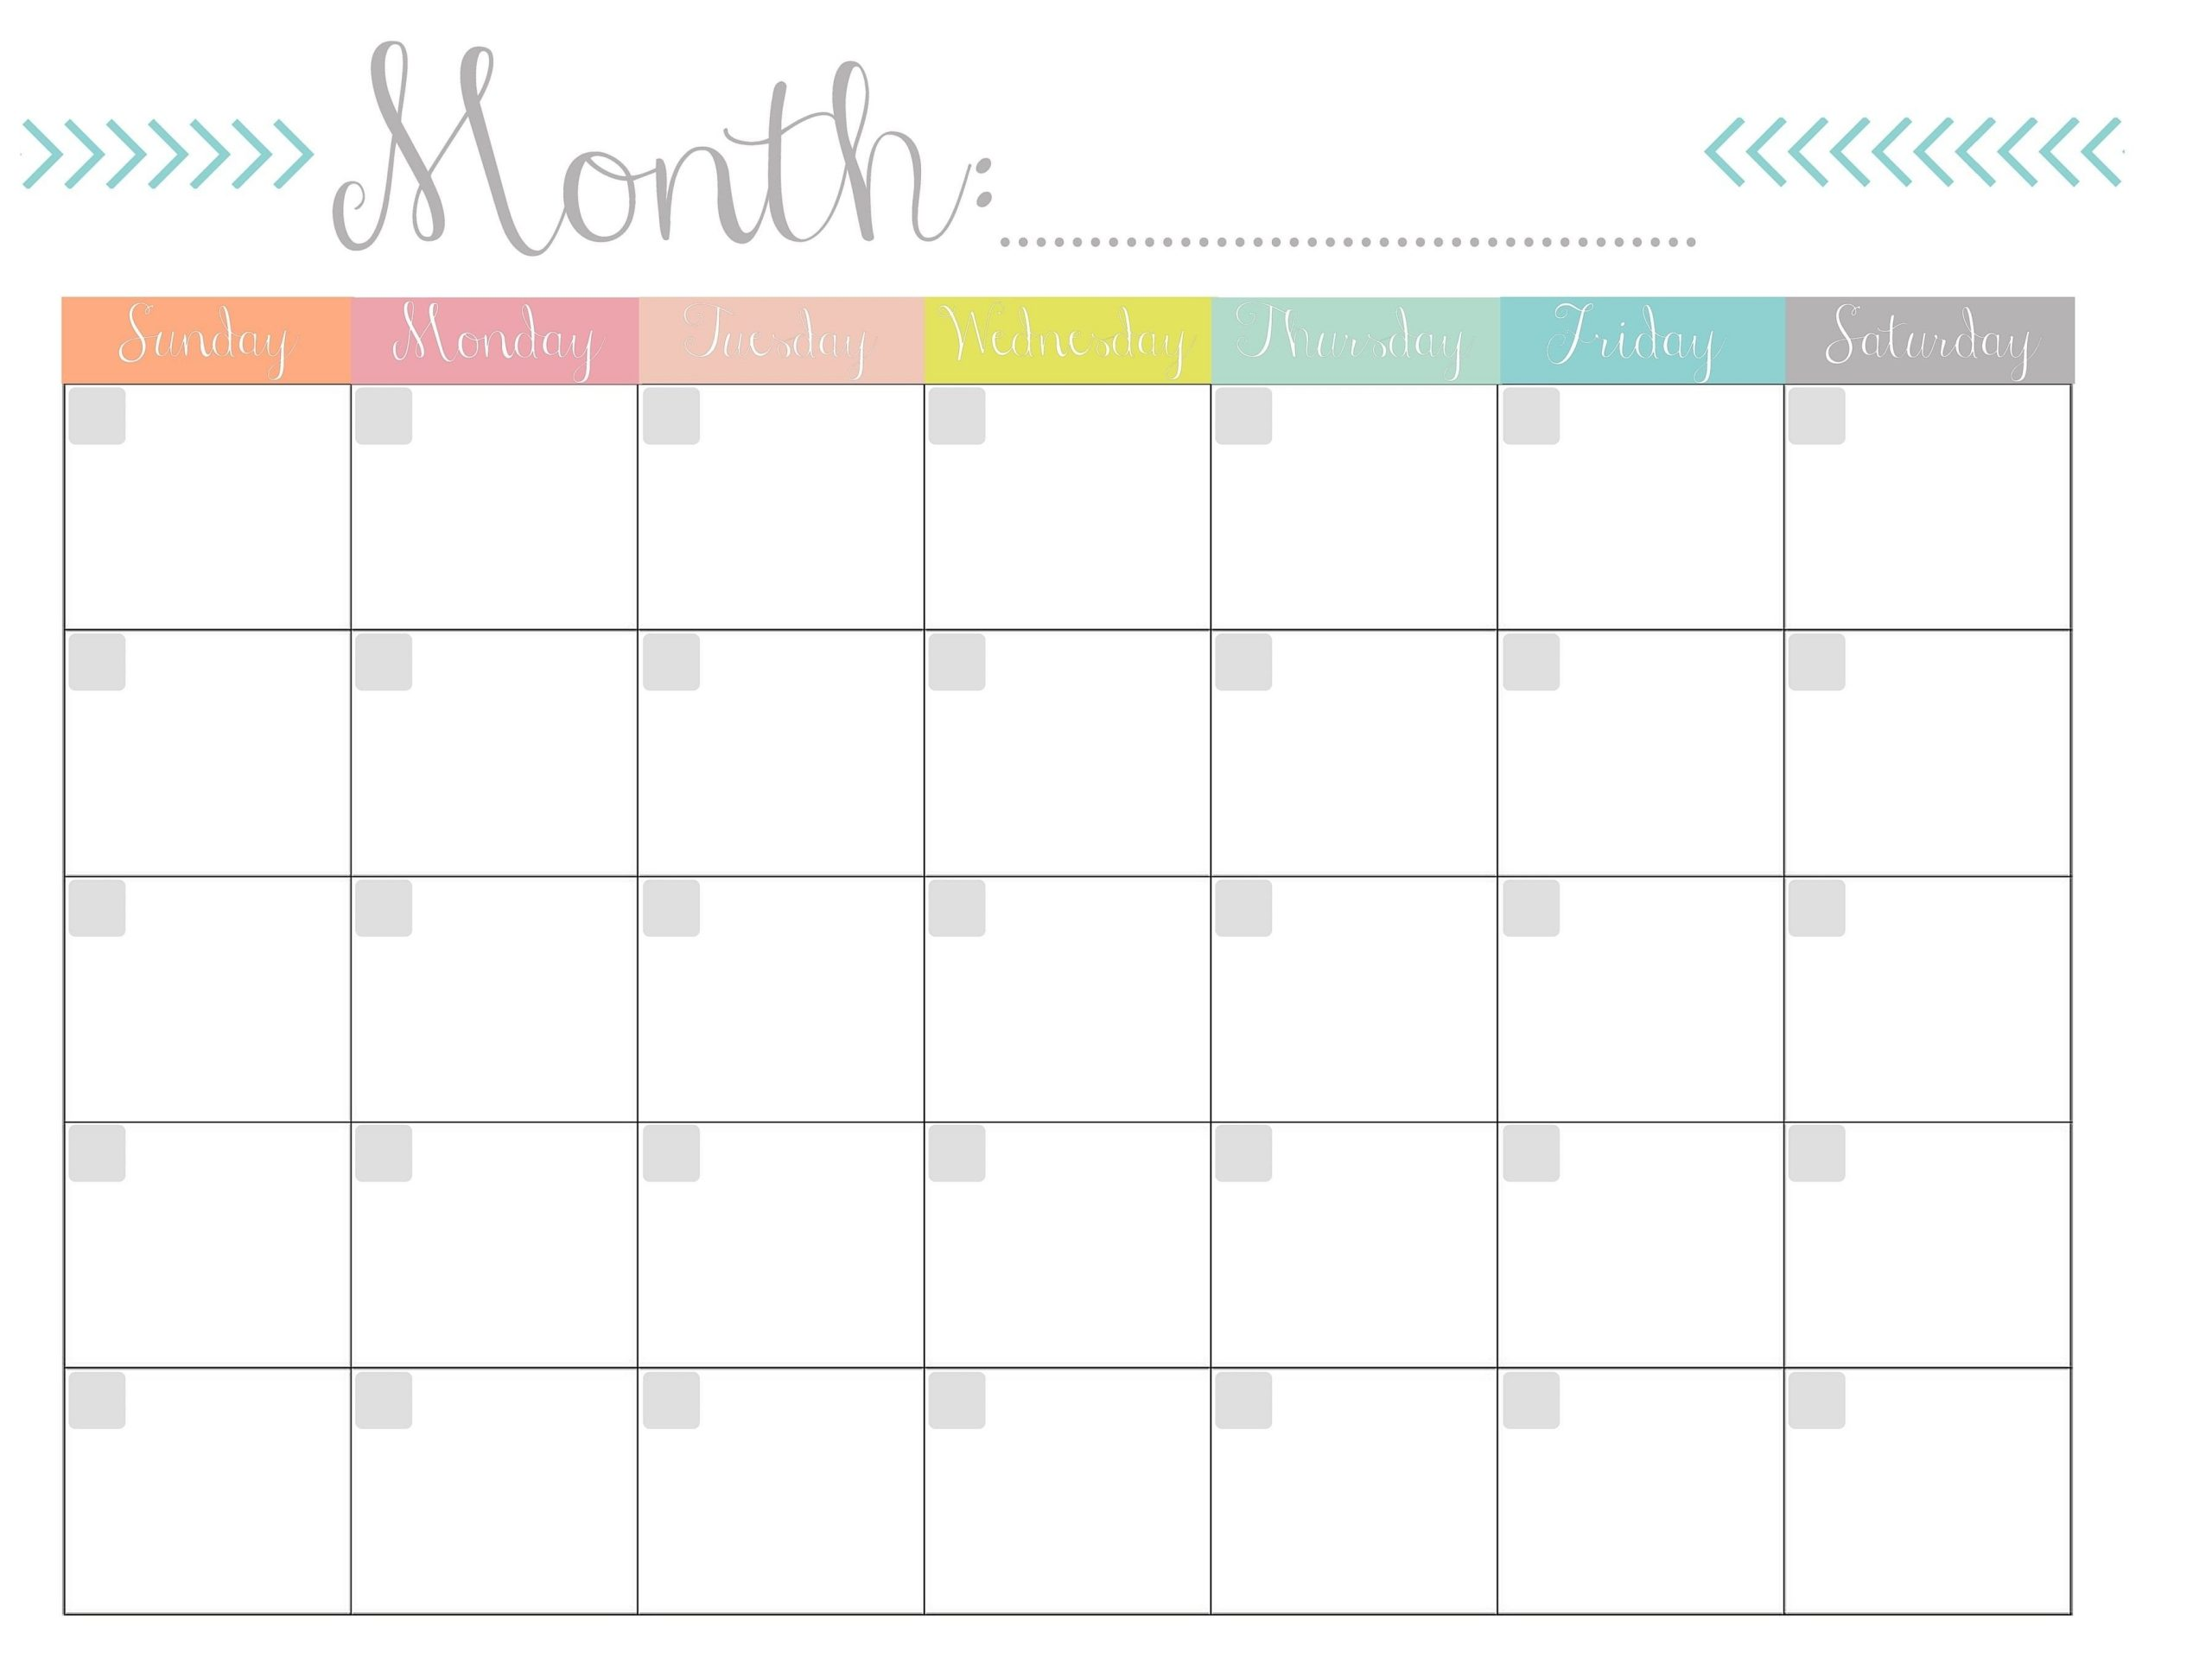 Online Printable Monthly Calendar | Free Printable Calendar Monthly, Monthly Calendar Template intended for Free Printable Monthly Calendar With Lines